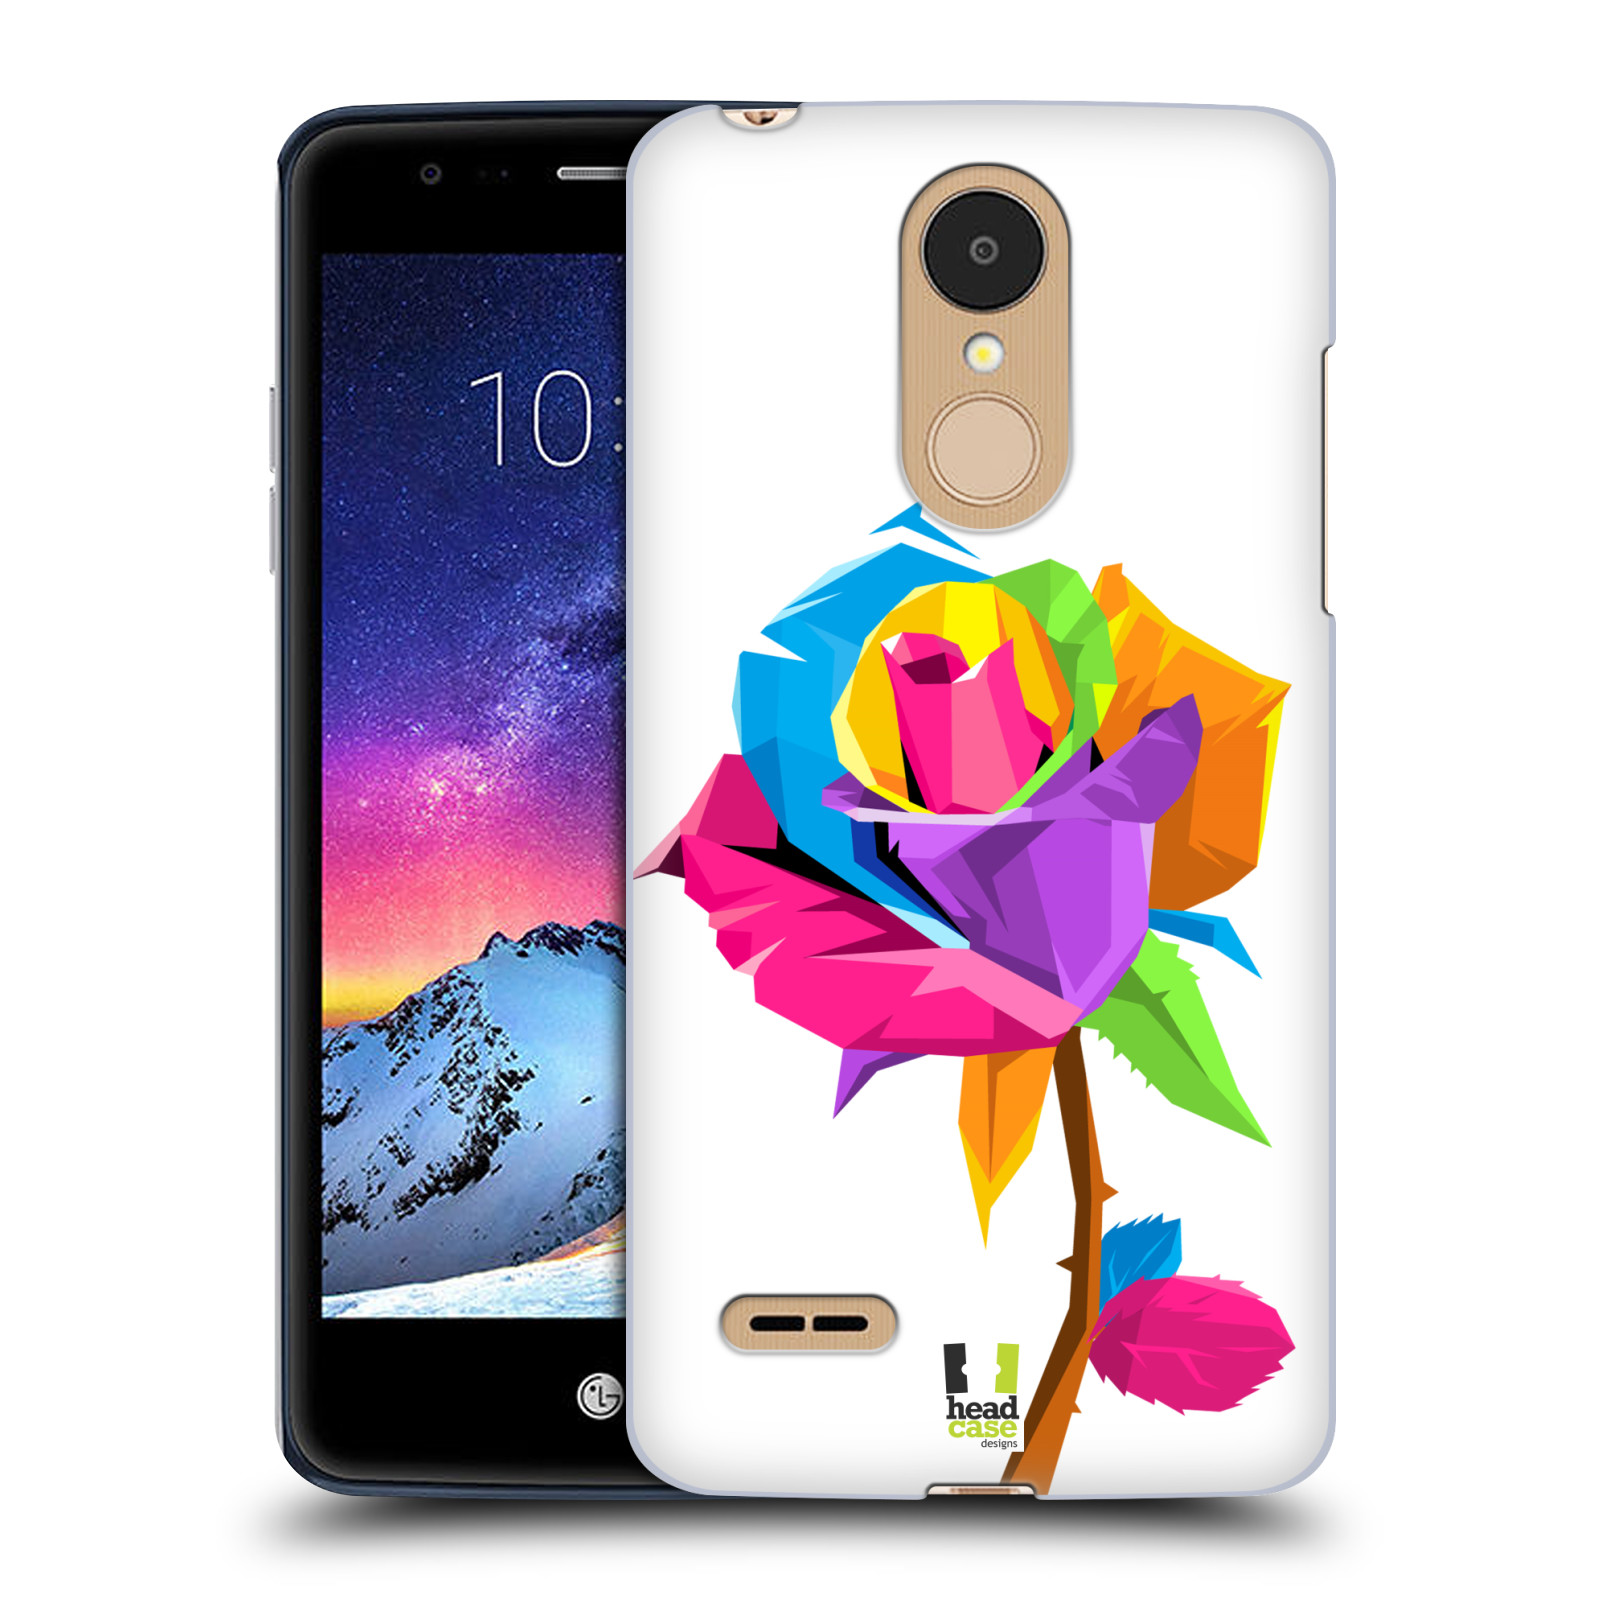 HEAD CASE plastový obal na mobil LG K9 / K8 2018 vzor POP ART kubismus růže